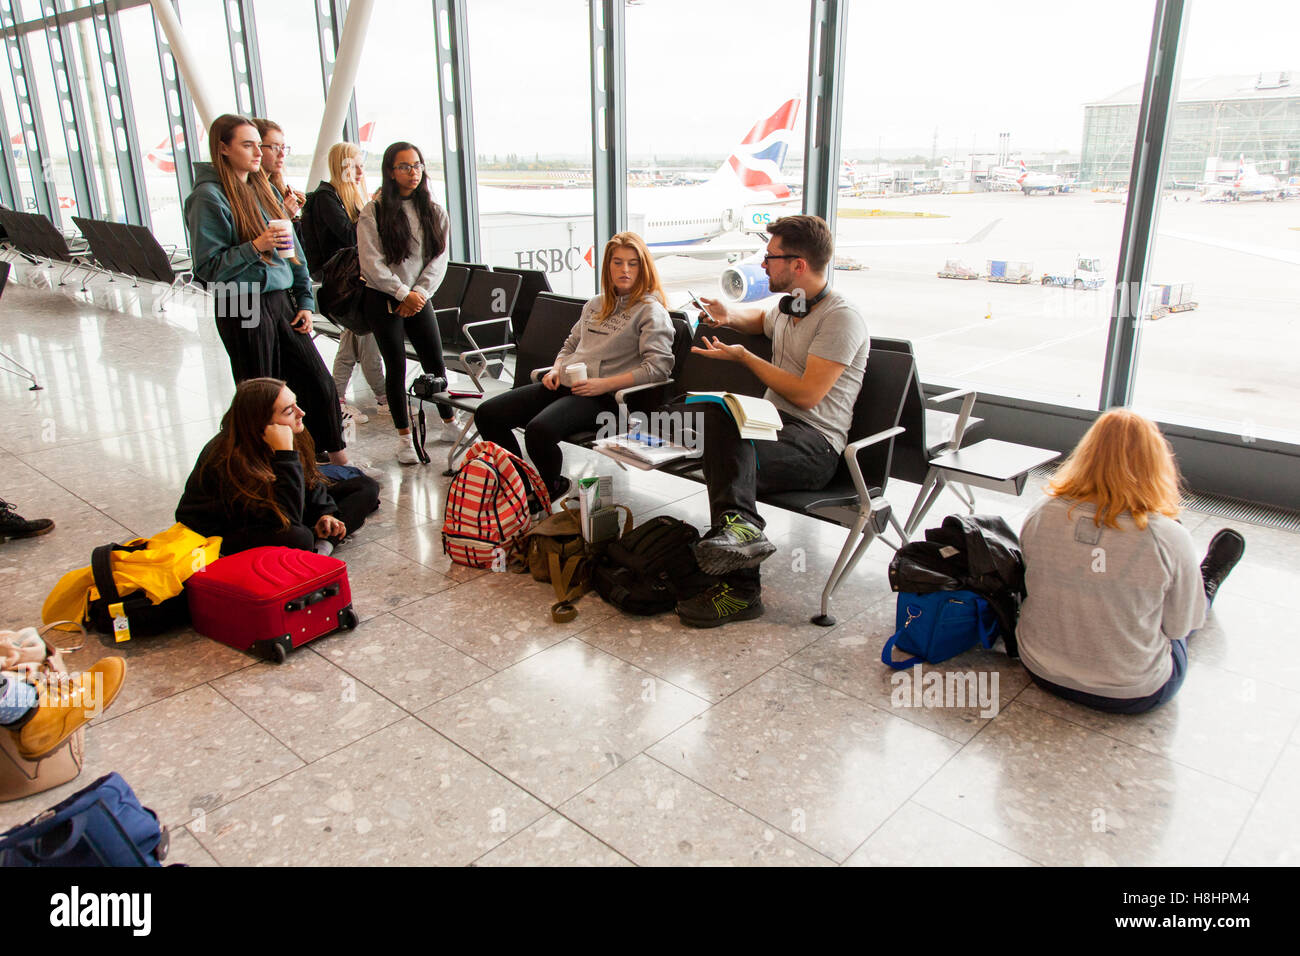 Cinq terminaux, l'aéroport de Heathrow, Londres, Angleterre, Royaume-Uni. Photo Stock